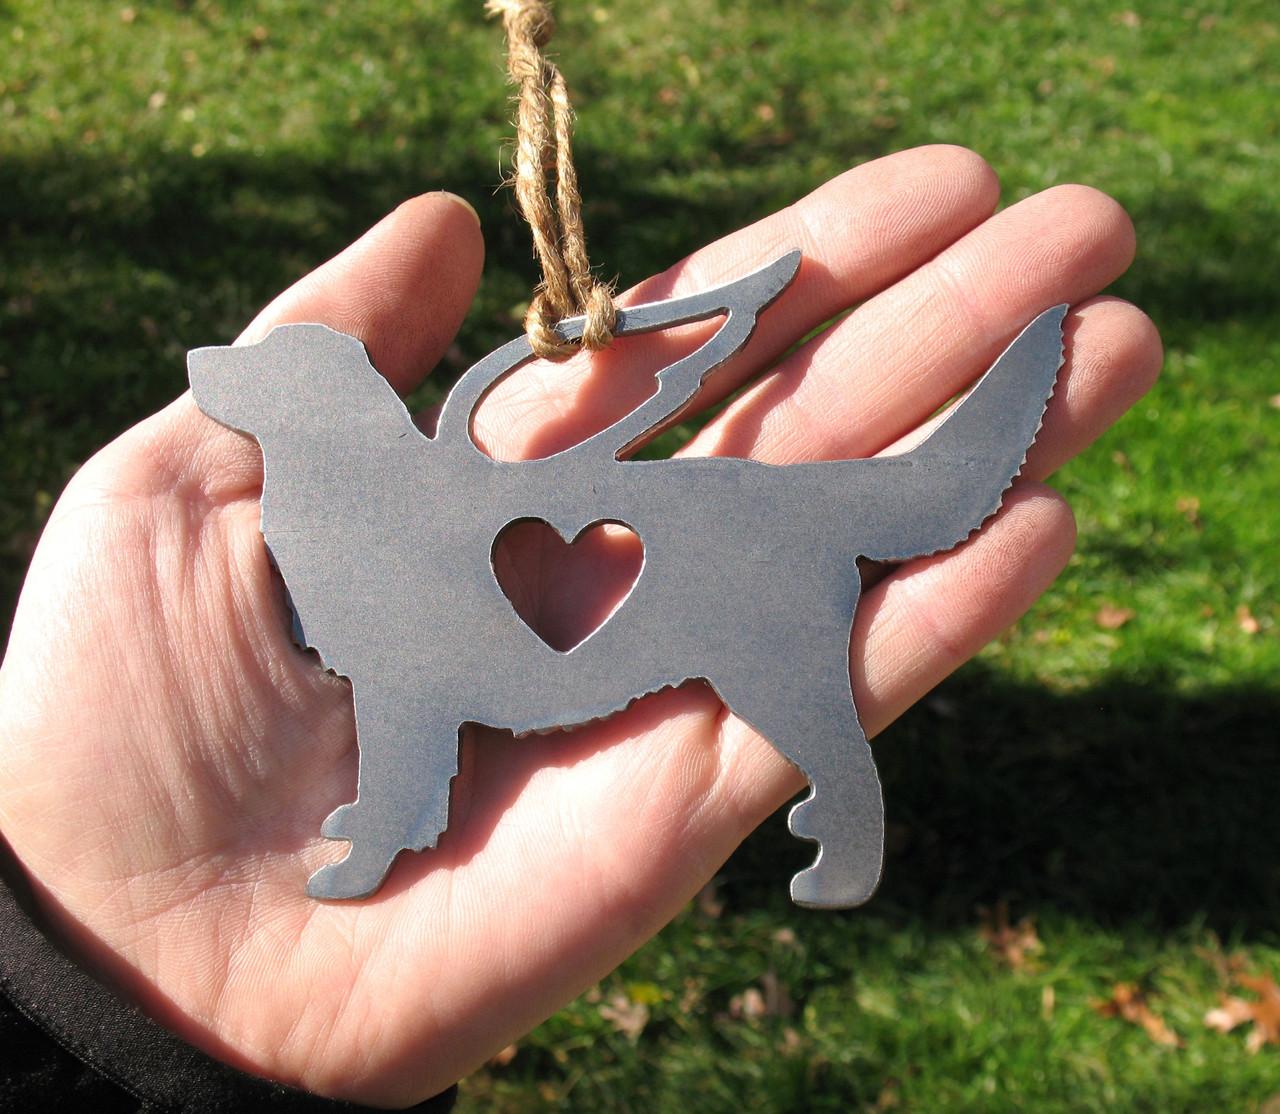 Golden Retriever 4 Pet Loss Gift Ornament Angel - Pet Memorial - Dog Sympathy Remembrance Gift - Metal Dog Christmas Ornament